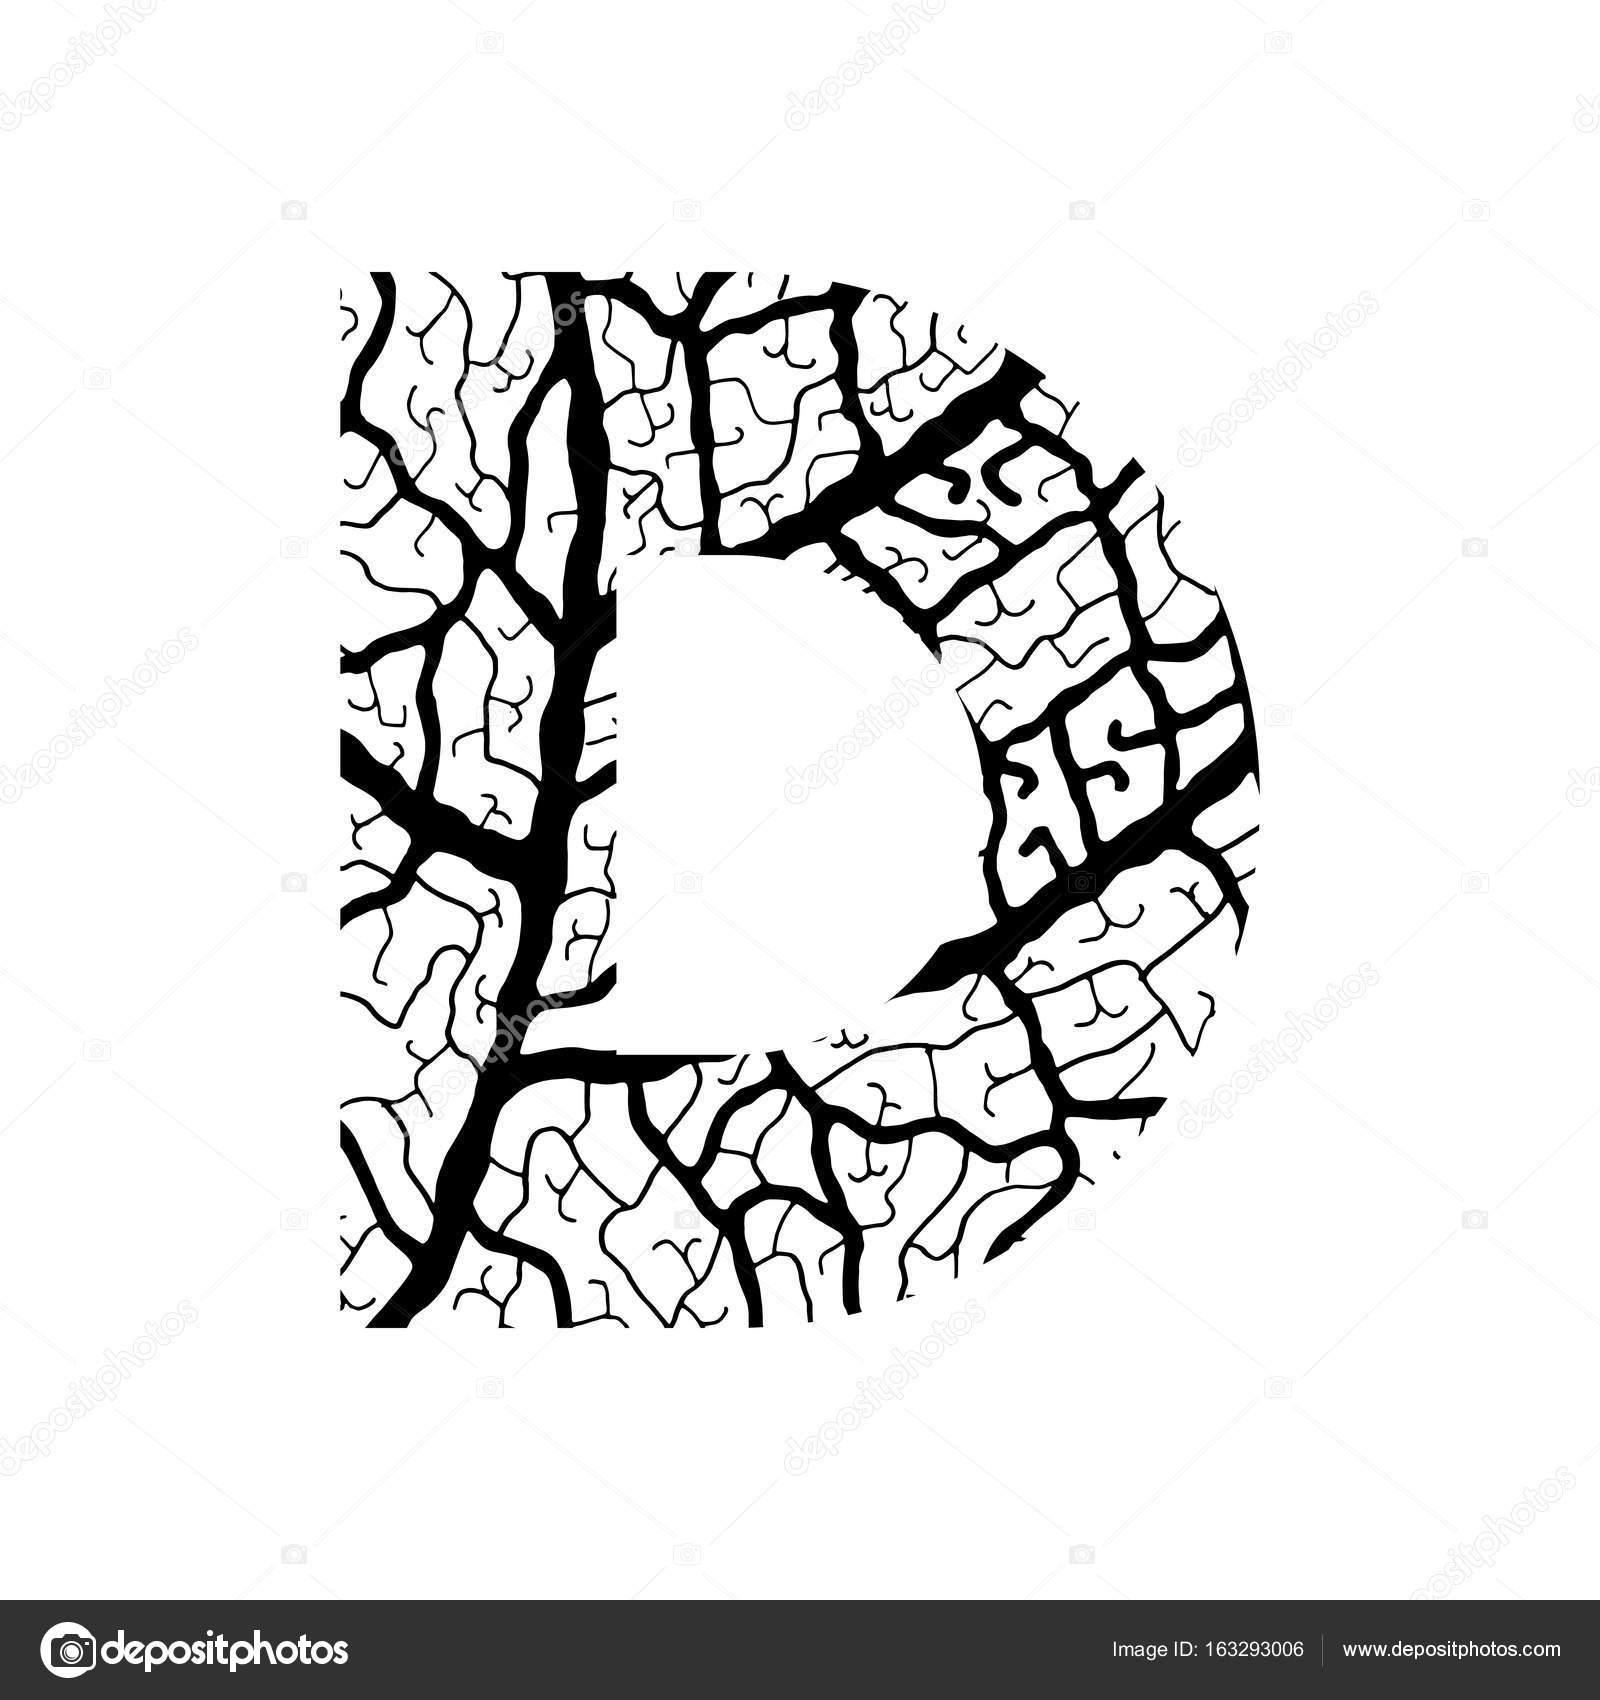 Nature alphabet ecology decorative font Capital letter D filled with leaf  veins pattern black on — 1fb89d5c9